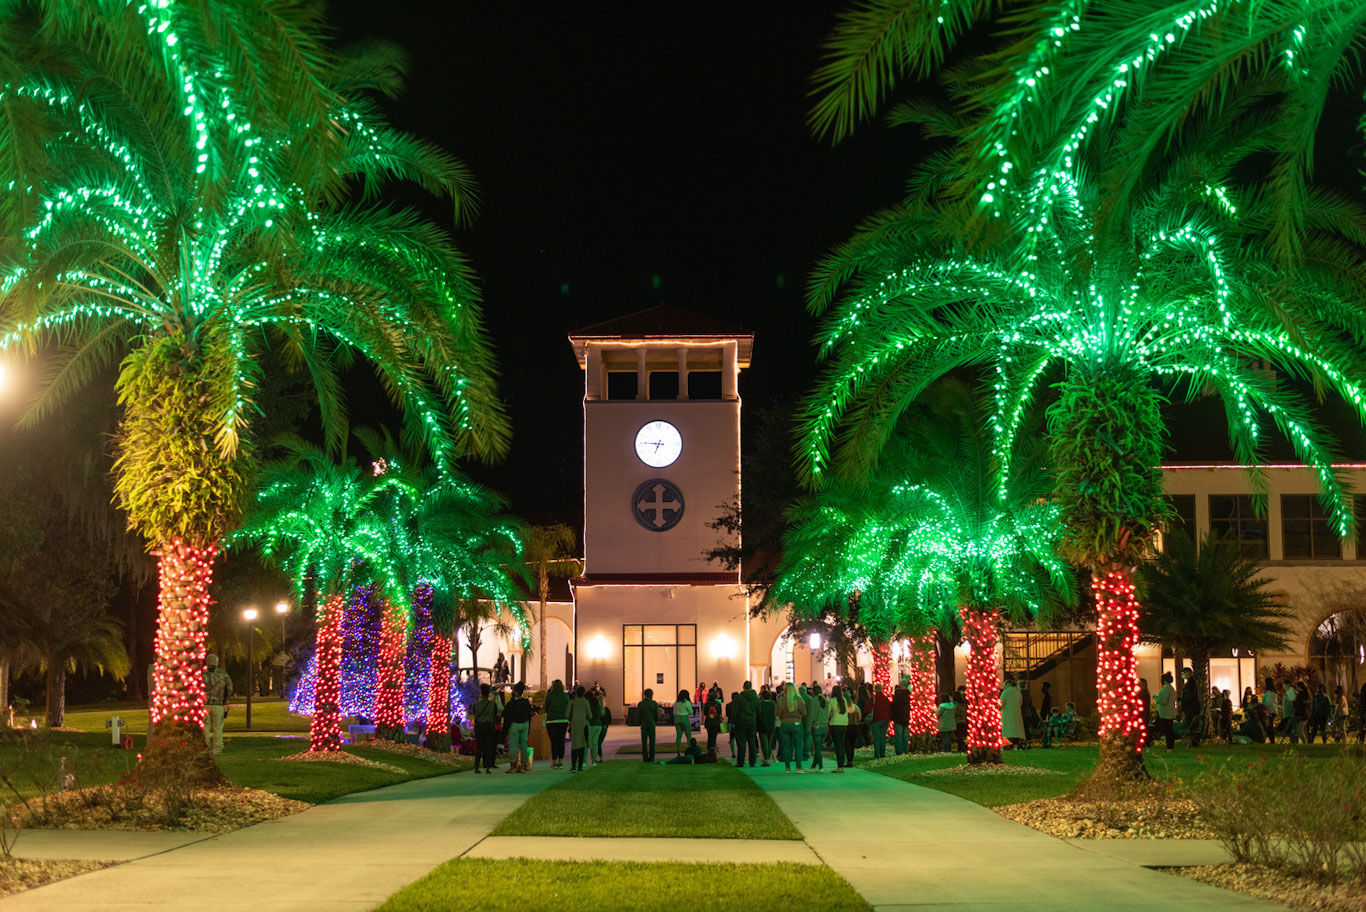 11-18-2020_Christmas Tree Lighting-_ASP4038_edited